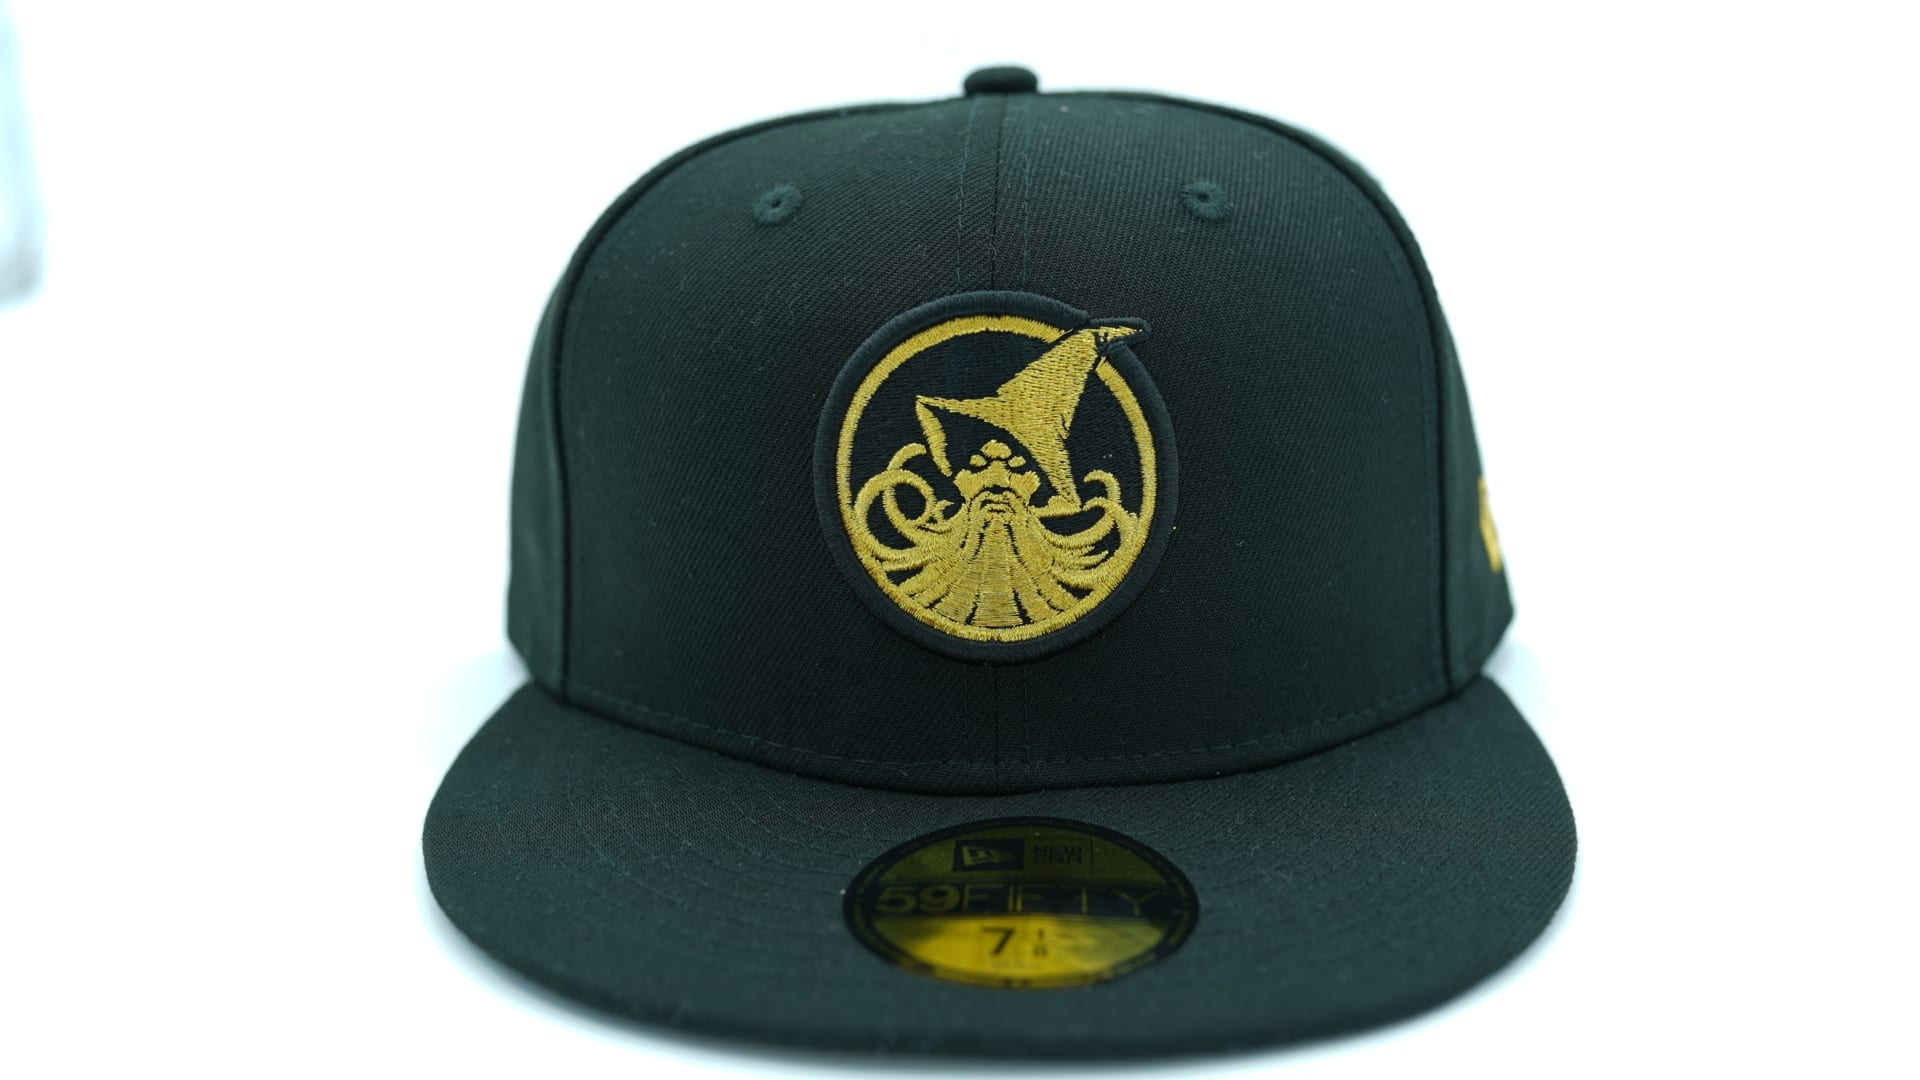 new-era-59Fifty-fitted-baseball-cap-hat.jpg